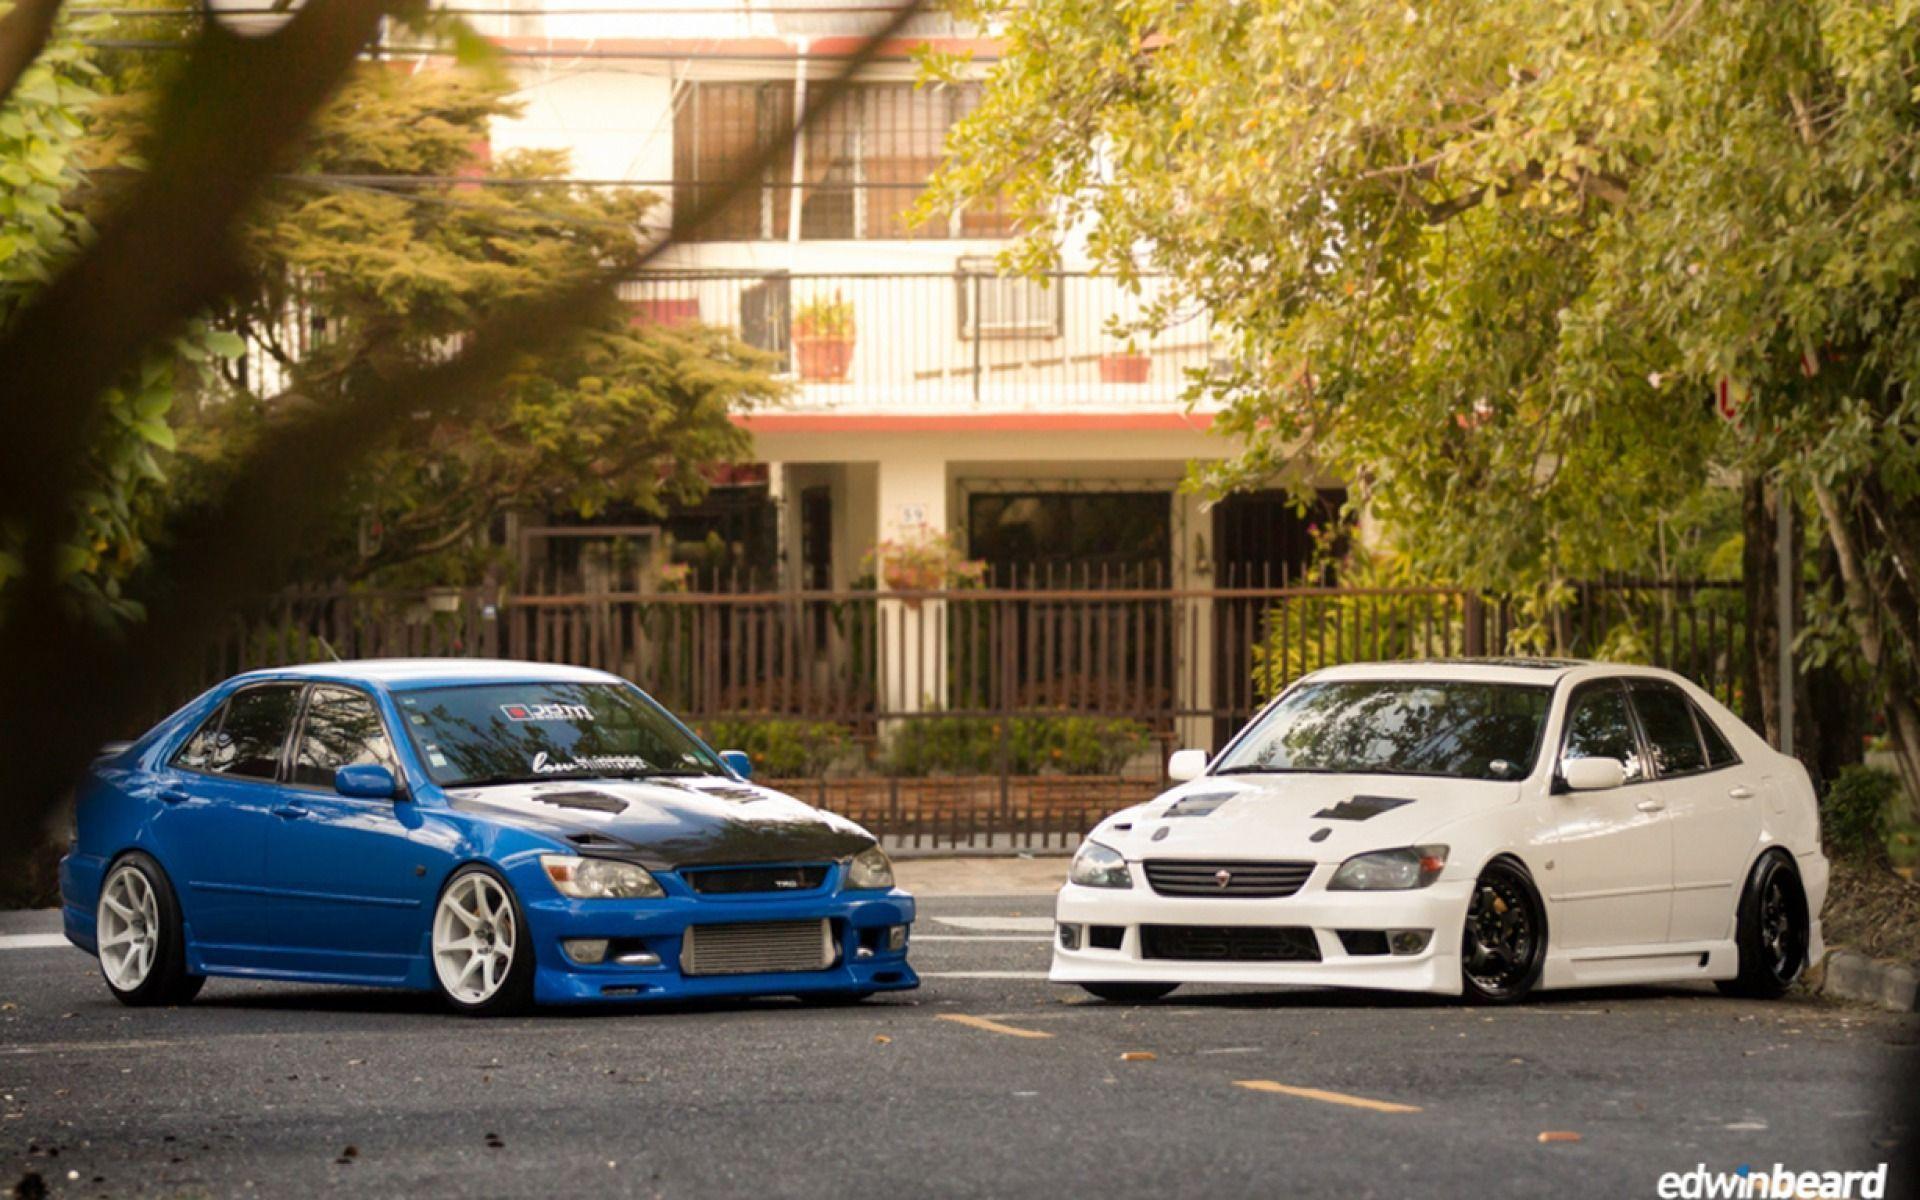 JDM Cars 4K Wallpapers - Top Free JDM Cars 4K Backgrounds ...